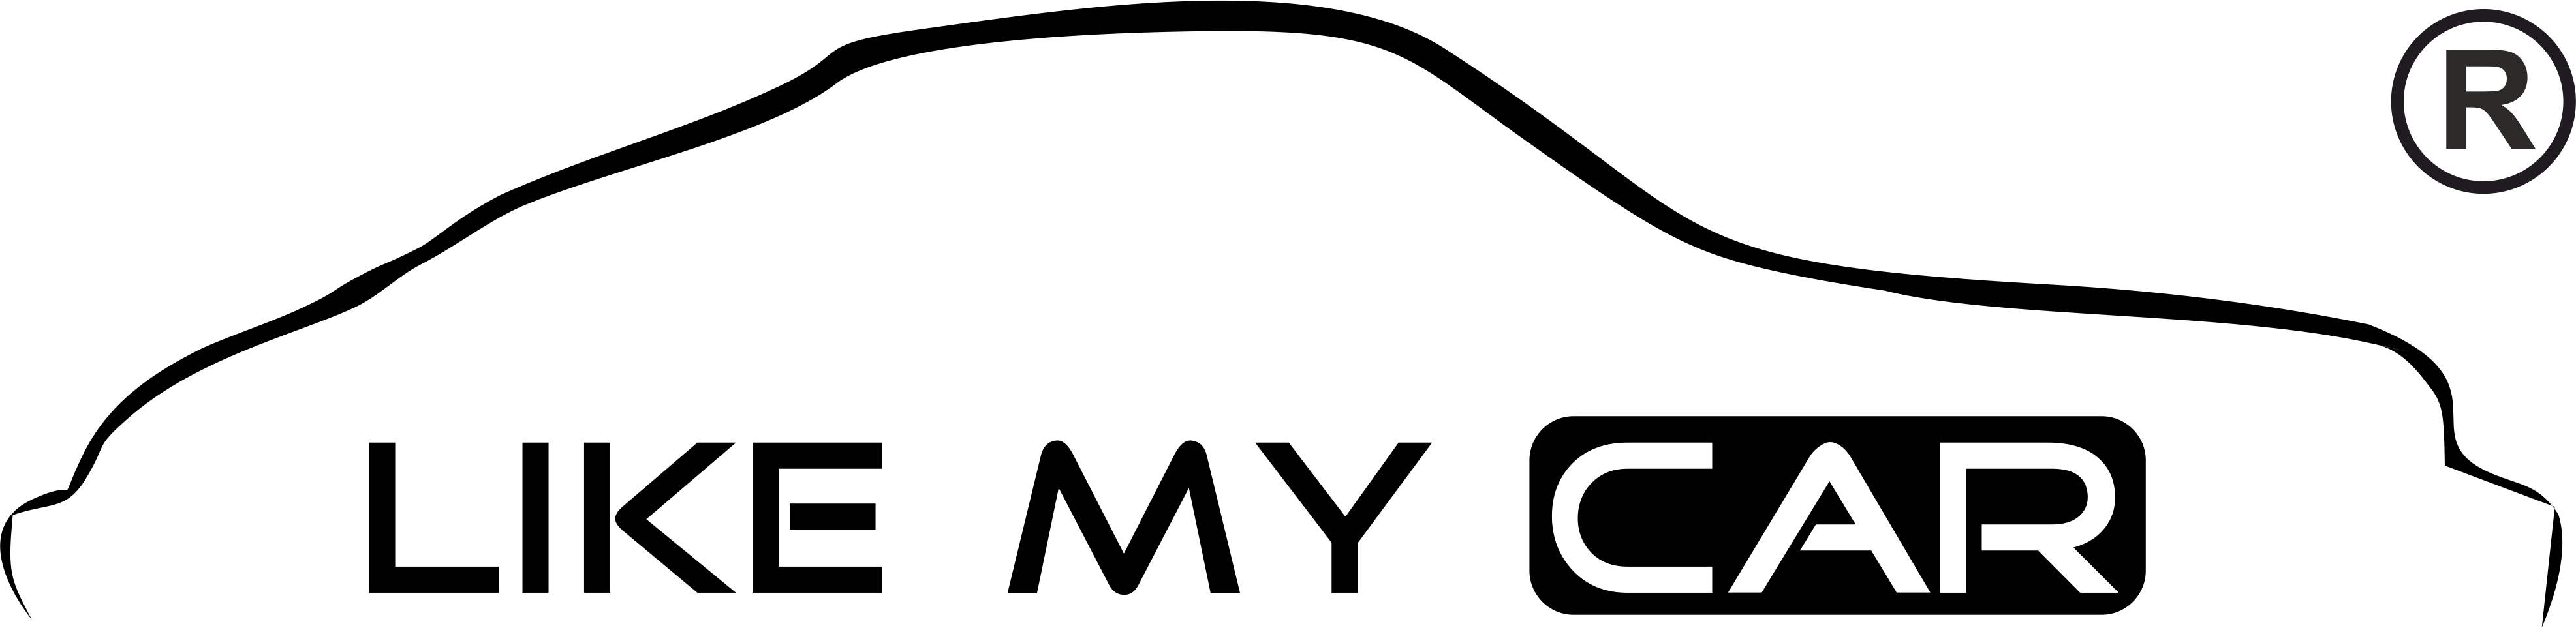 LikeMyCar